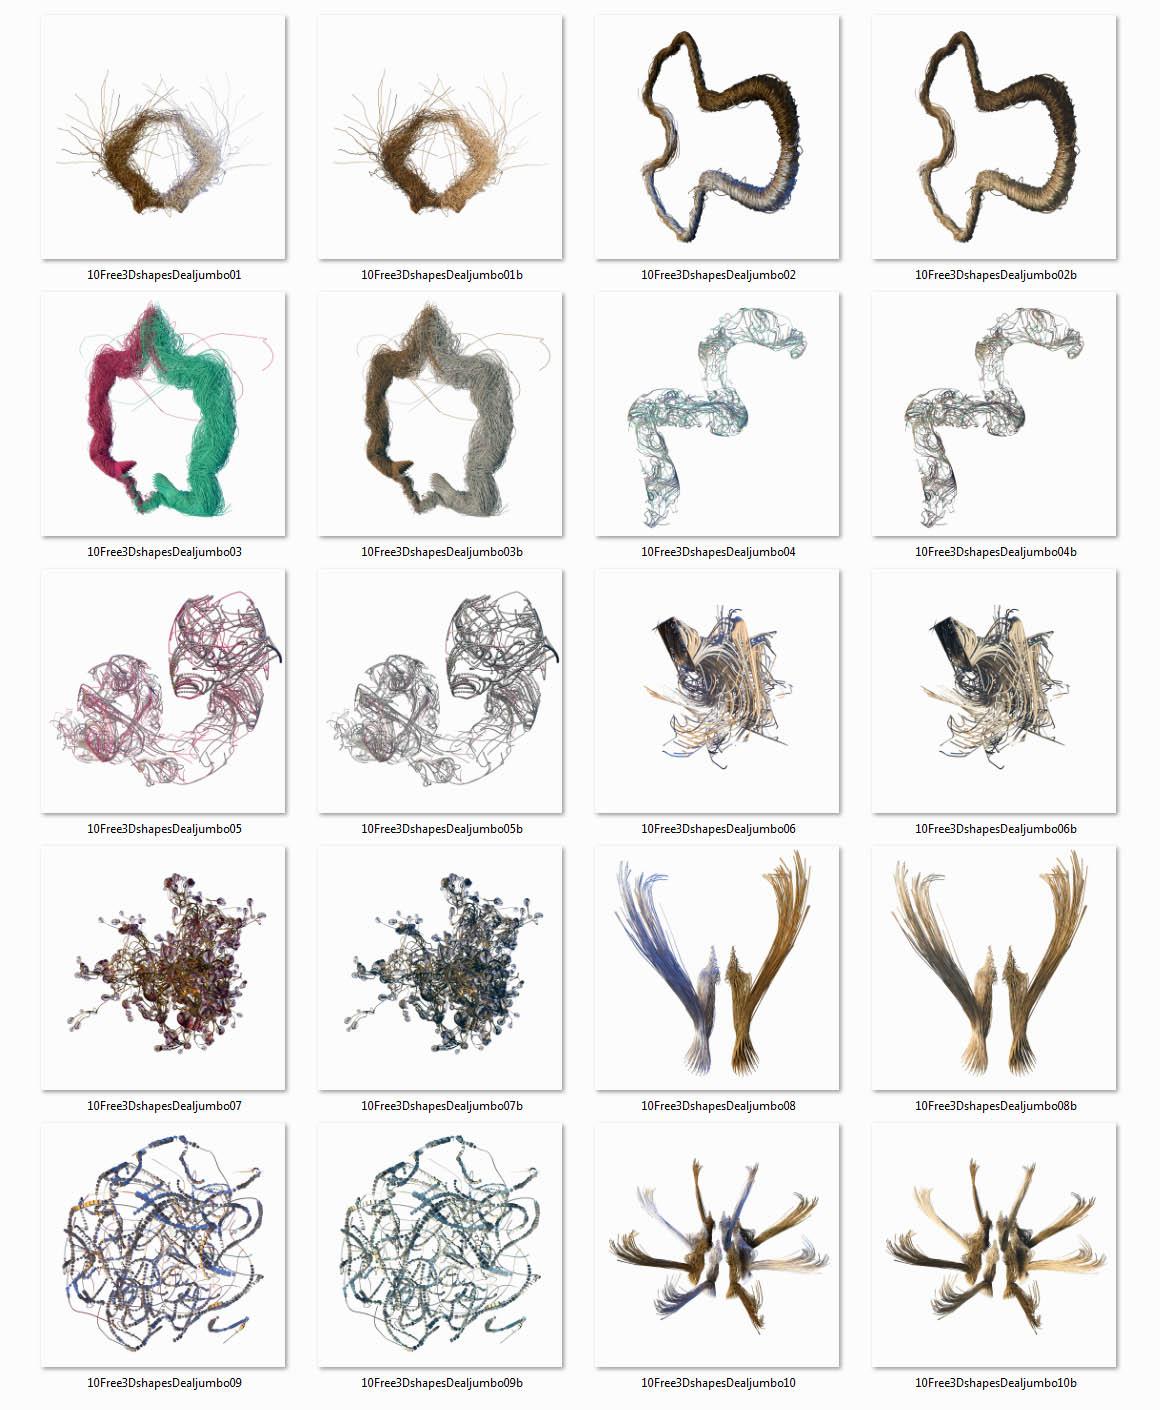 10-Free-3D-shapes-Dealjumbo-5